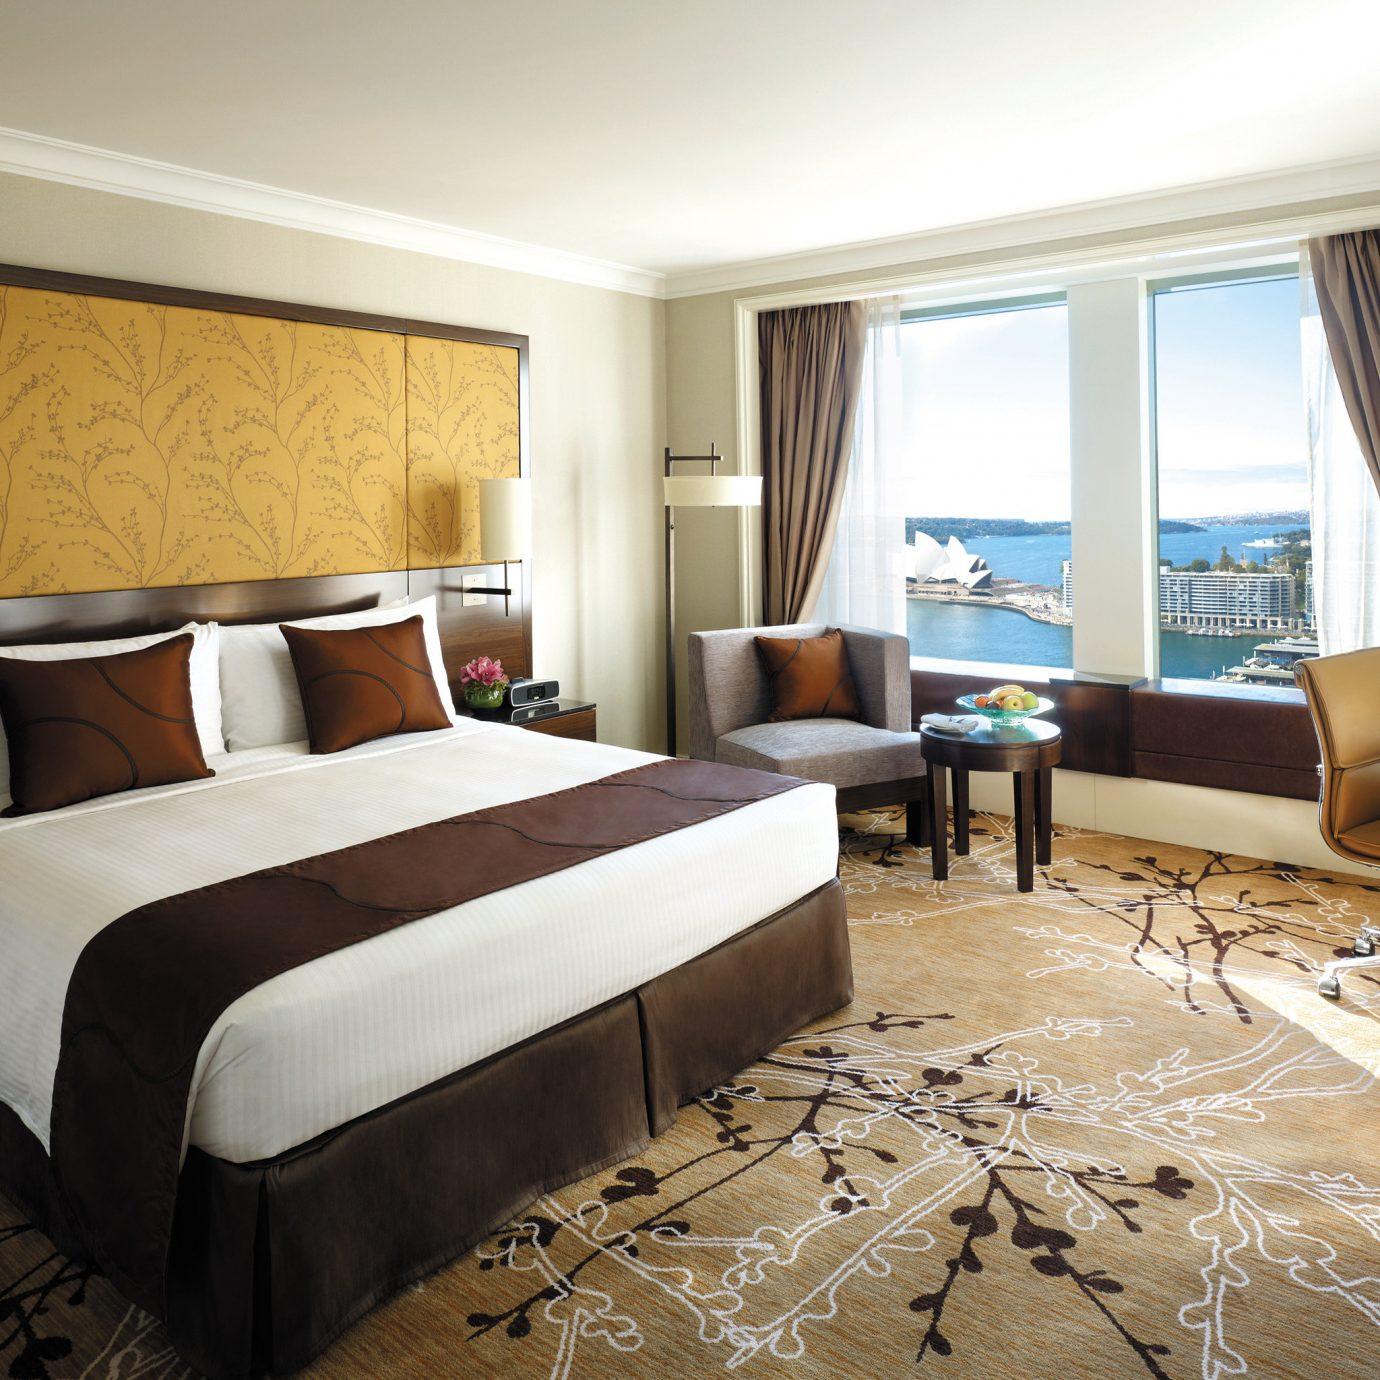 Bedroom City Classic Hotels Luxury property Suite condominium home living room cottage